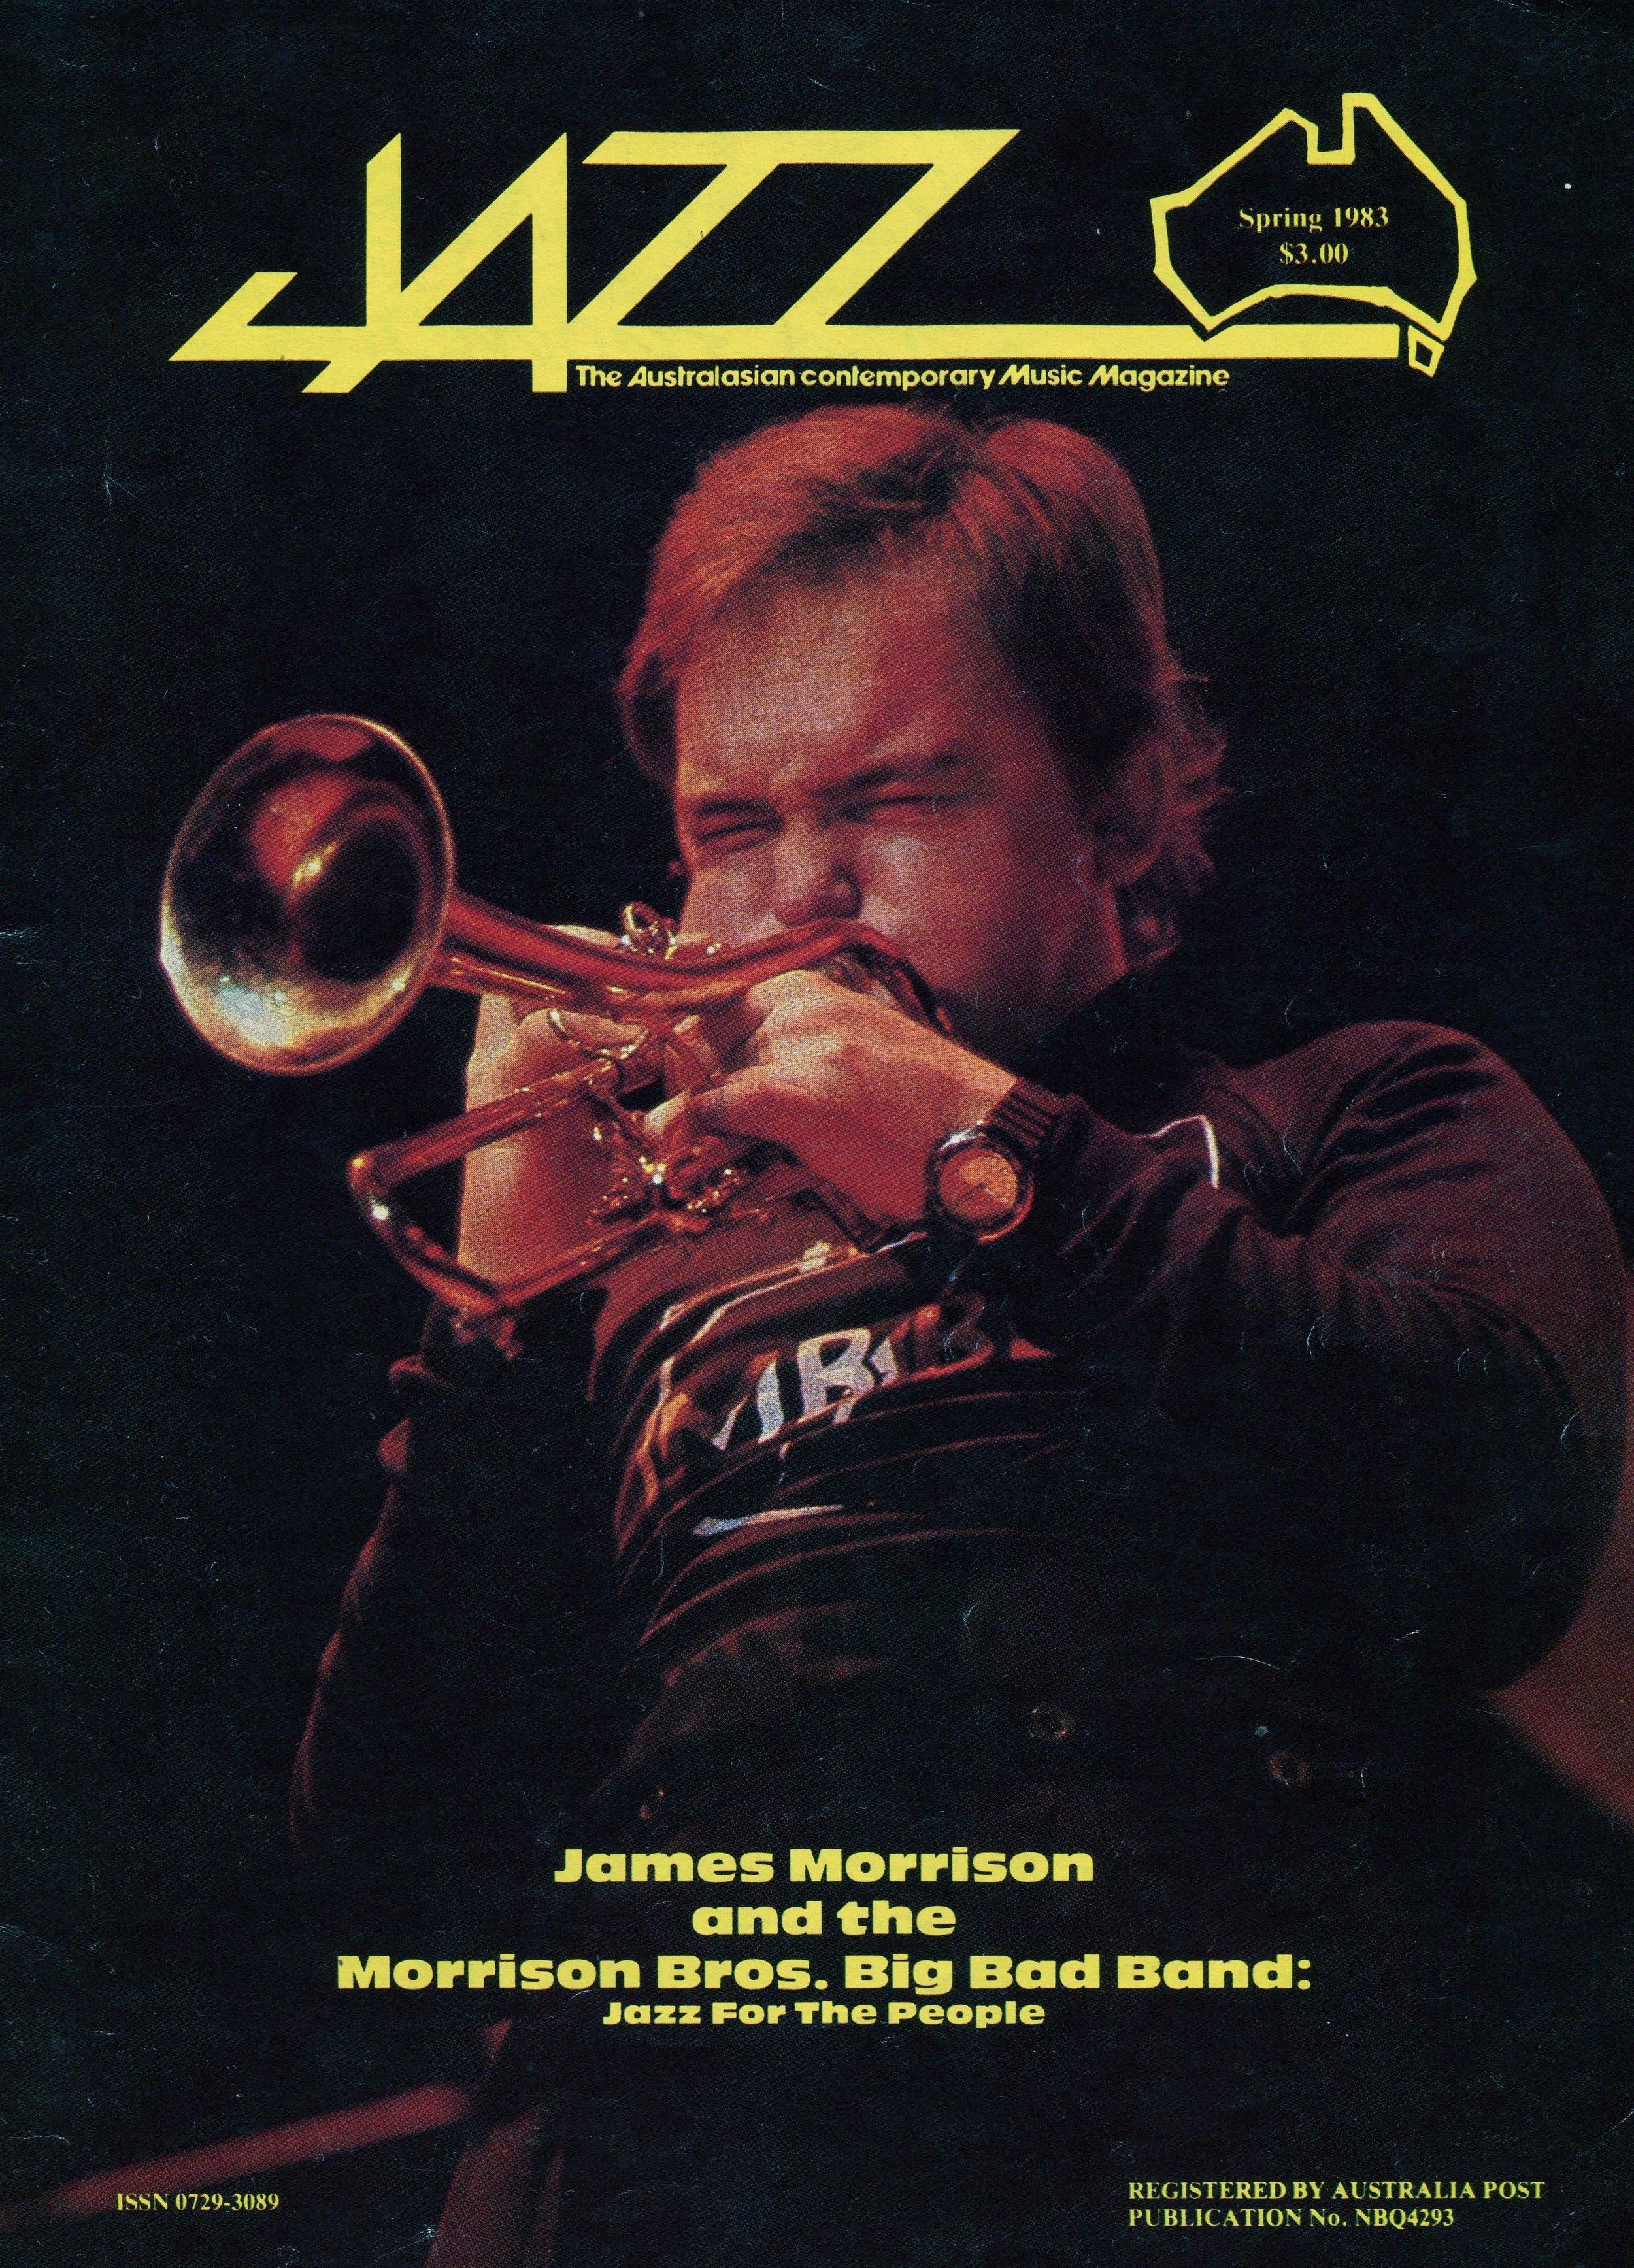 JazzMagazineSpring83FrontCover.jpg